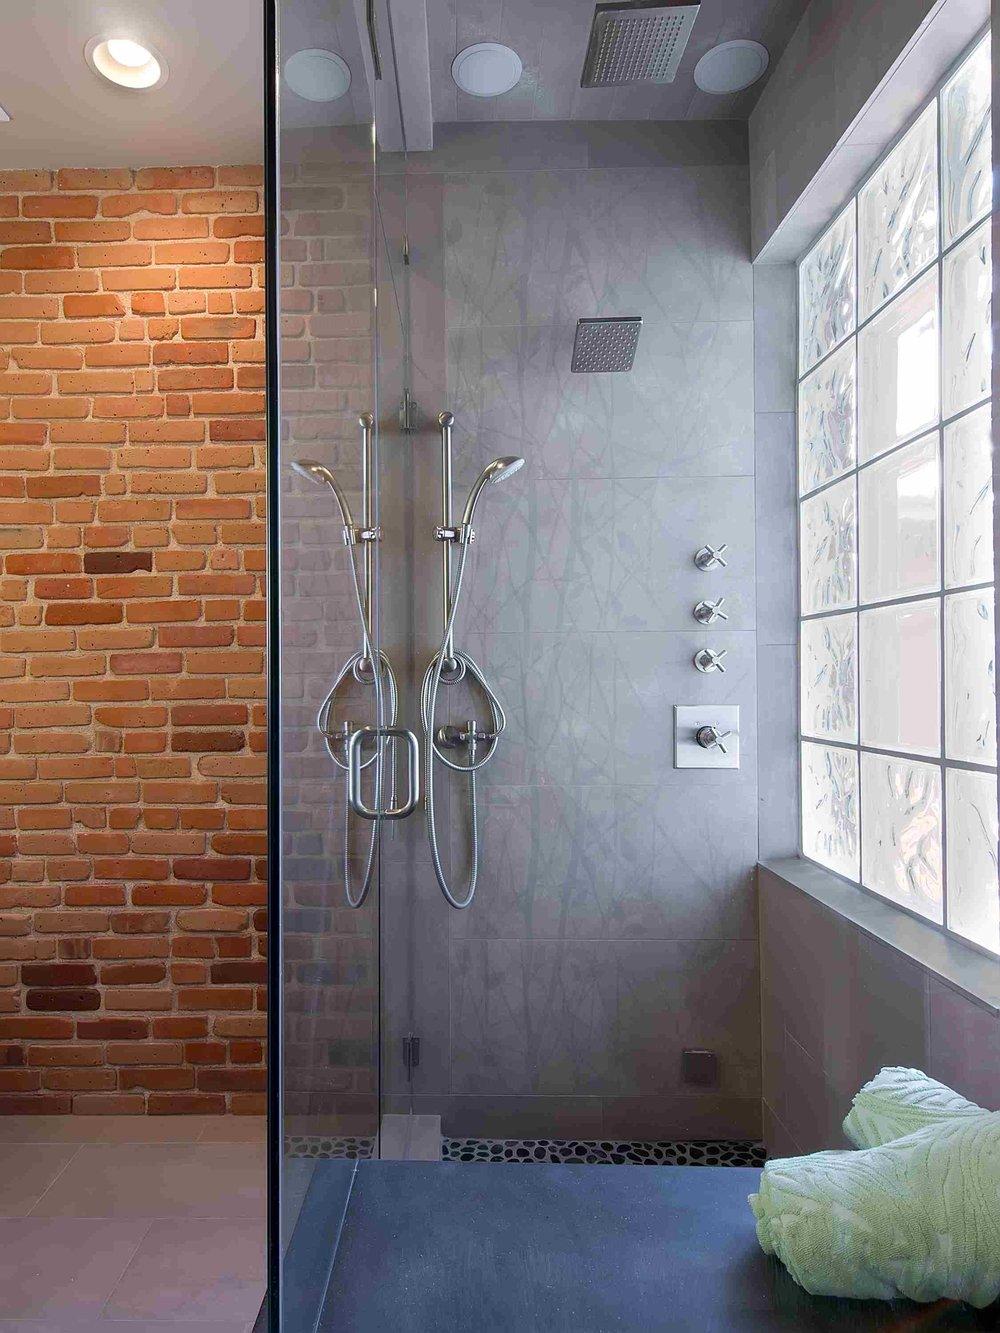 Brick and concrete bathroom